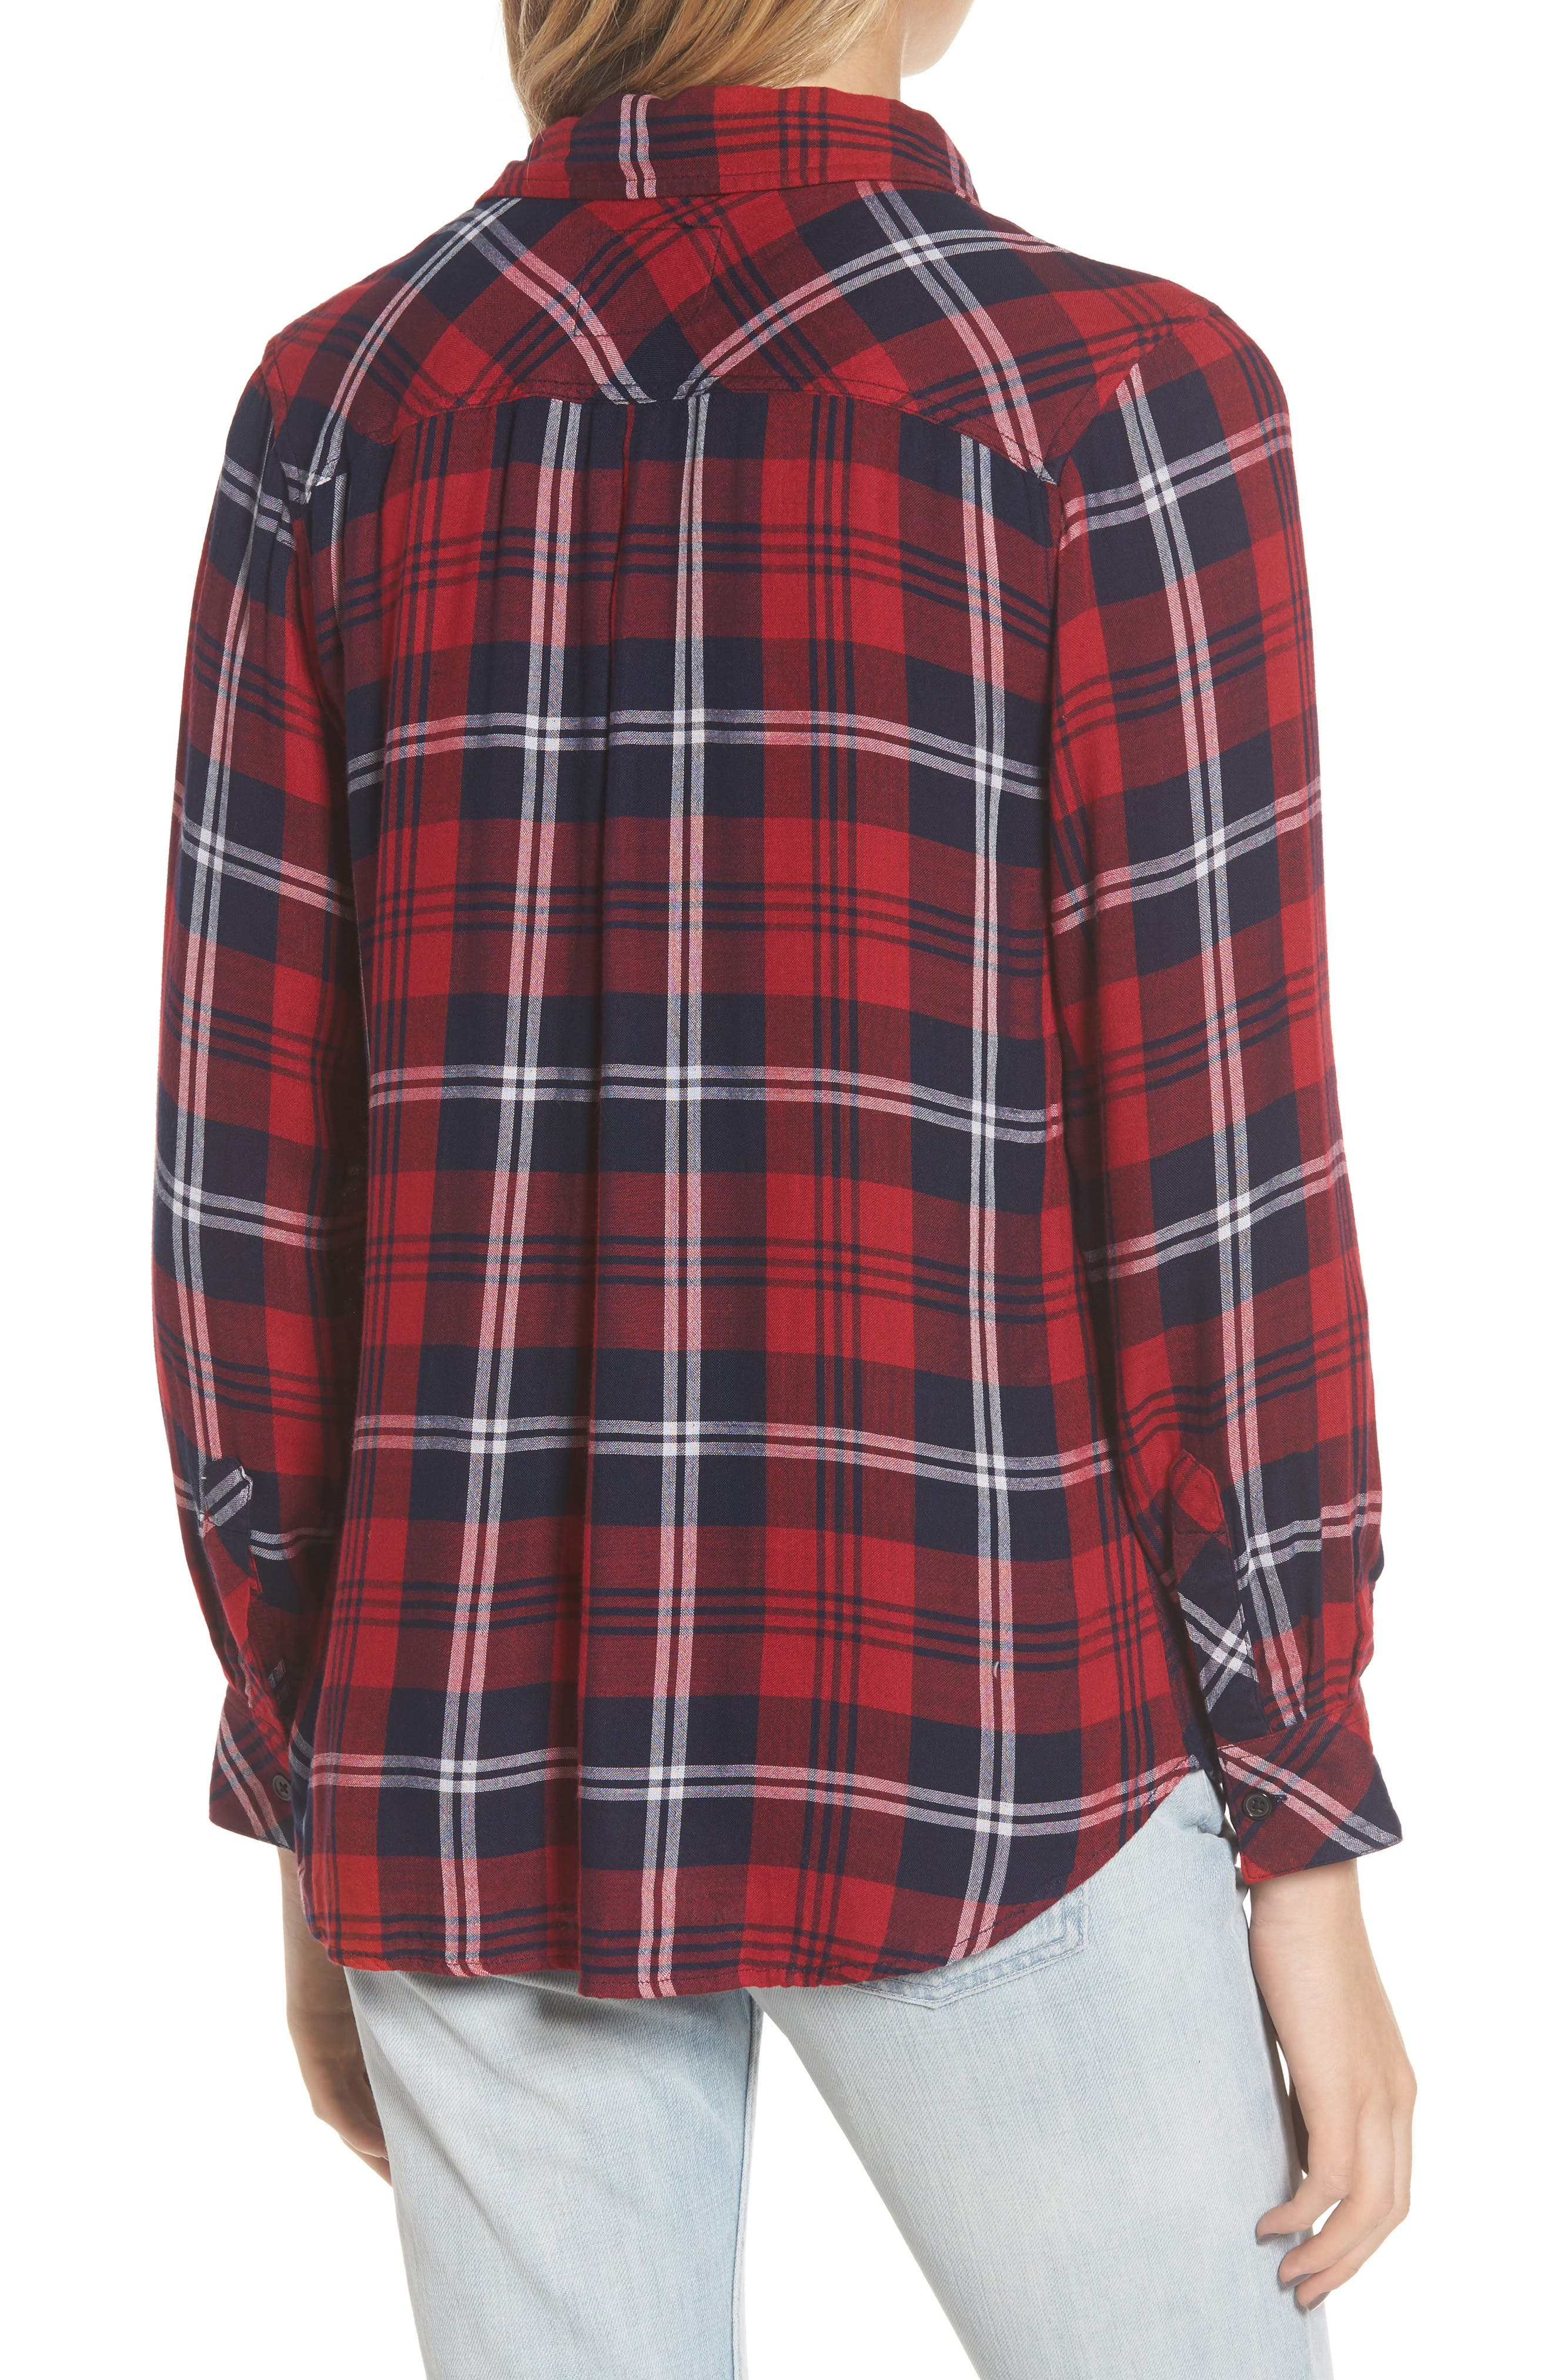 Taitum Plaid Shirt,                             Alternate thumbnail 2, color,                             622